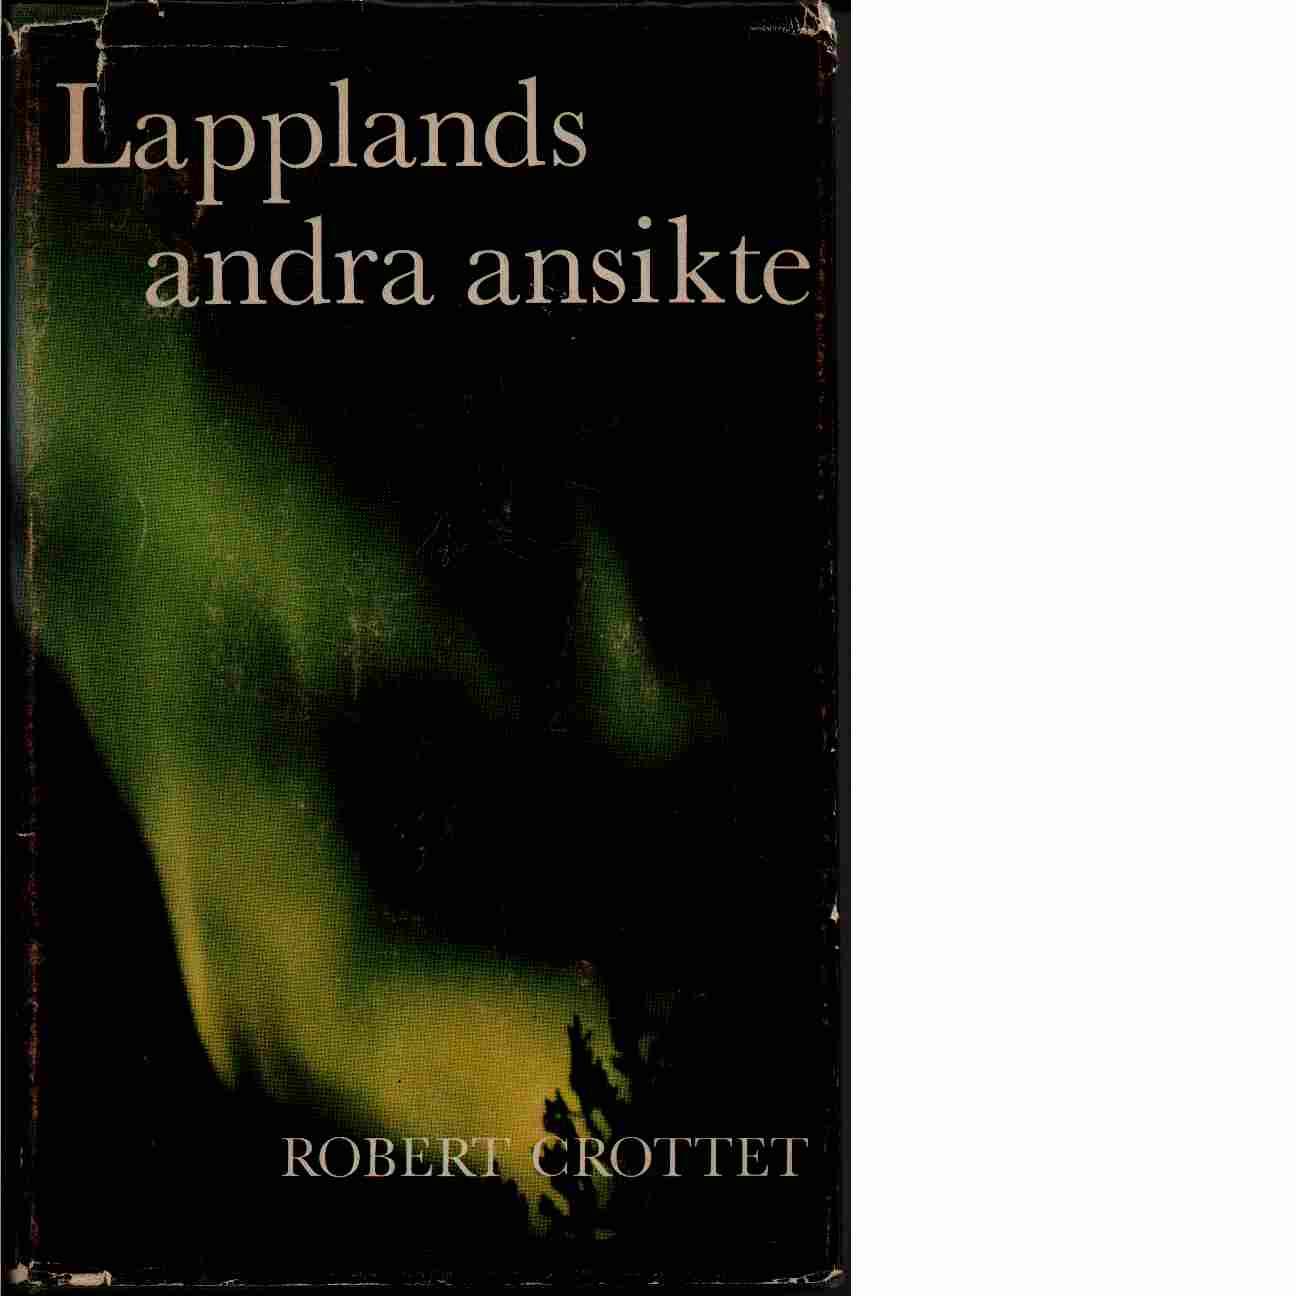 Lapplands andra ansikte - Crottet, Robert